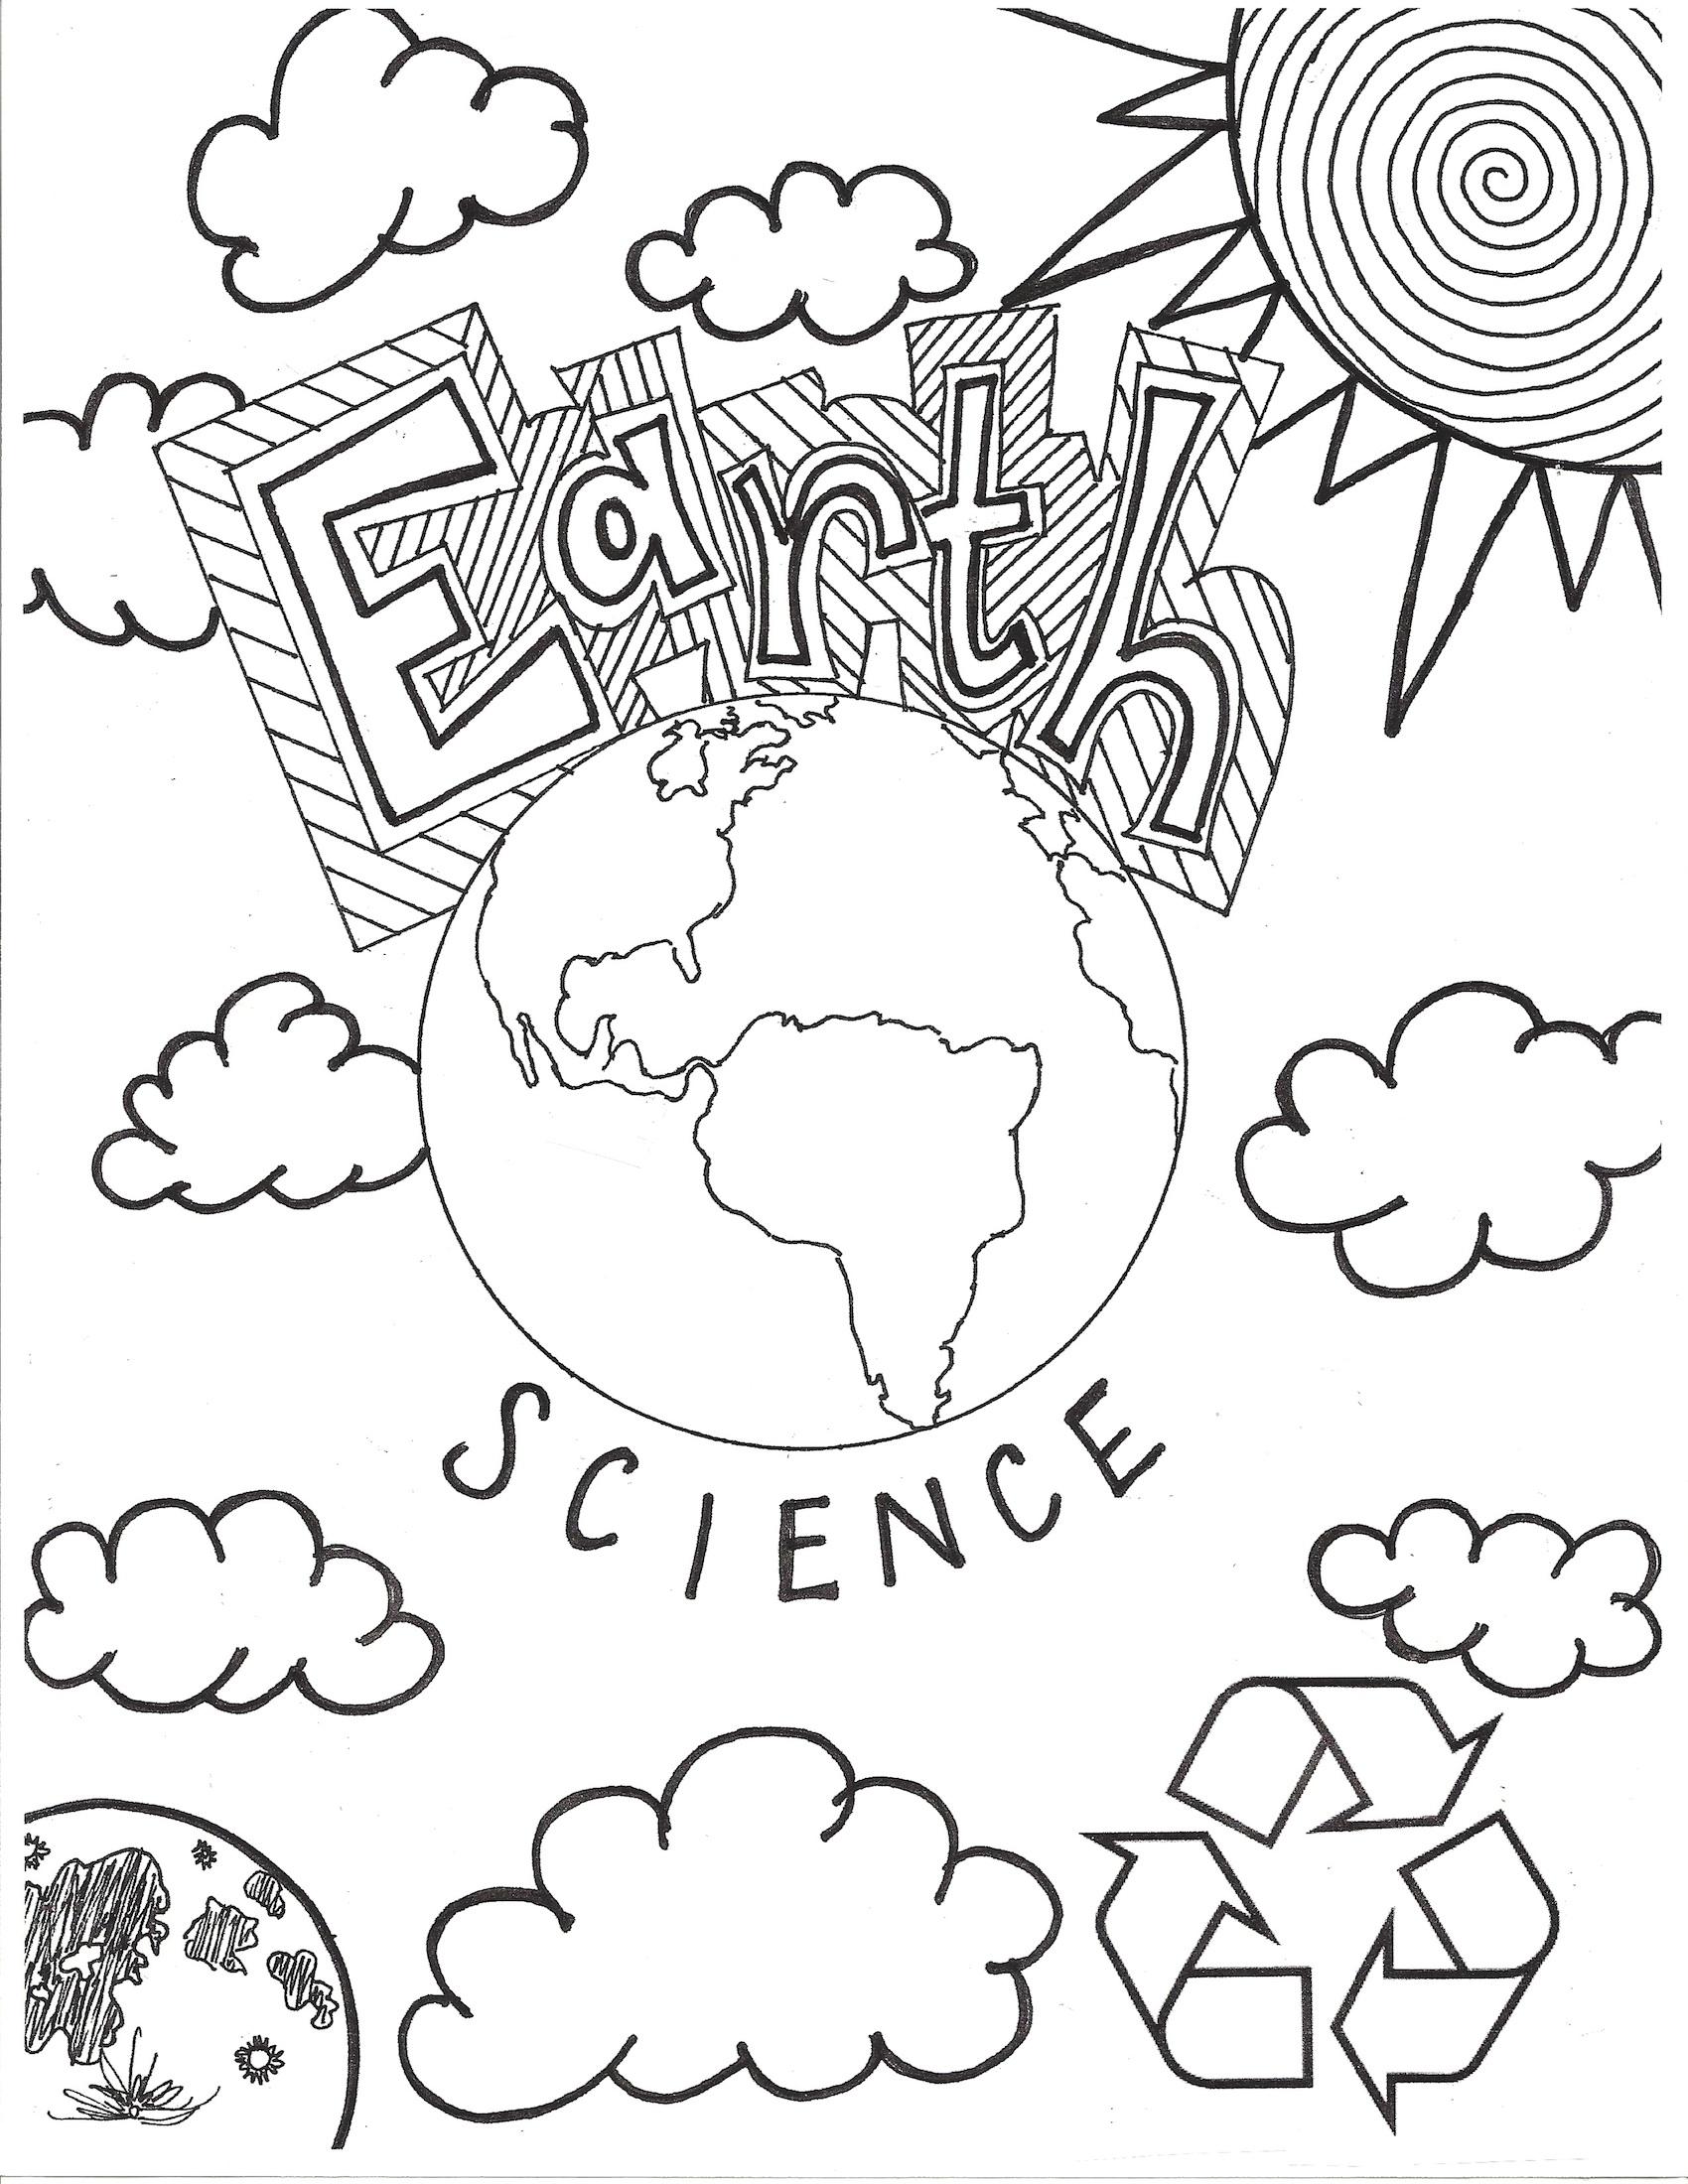 Scientific coloring #1, Download drawings